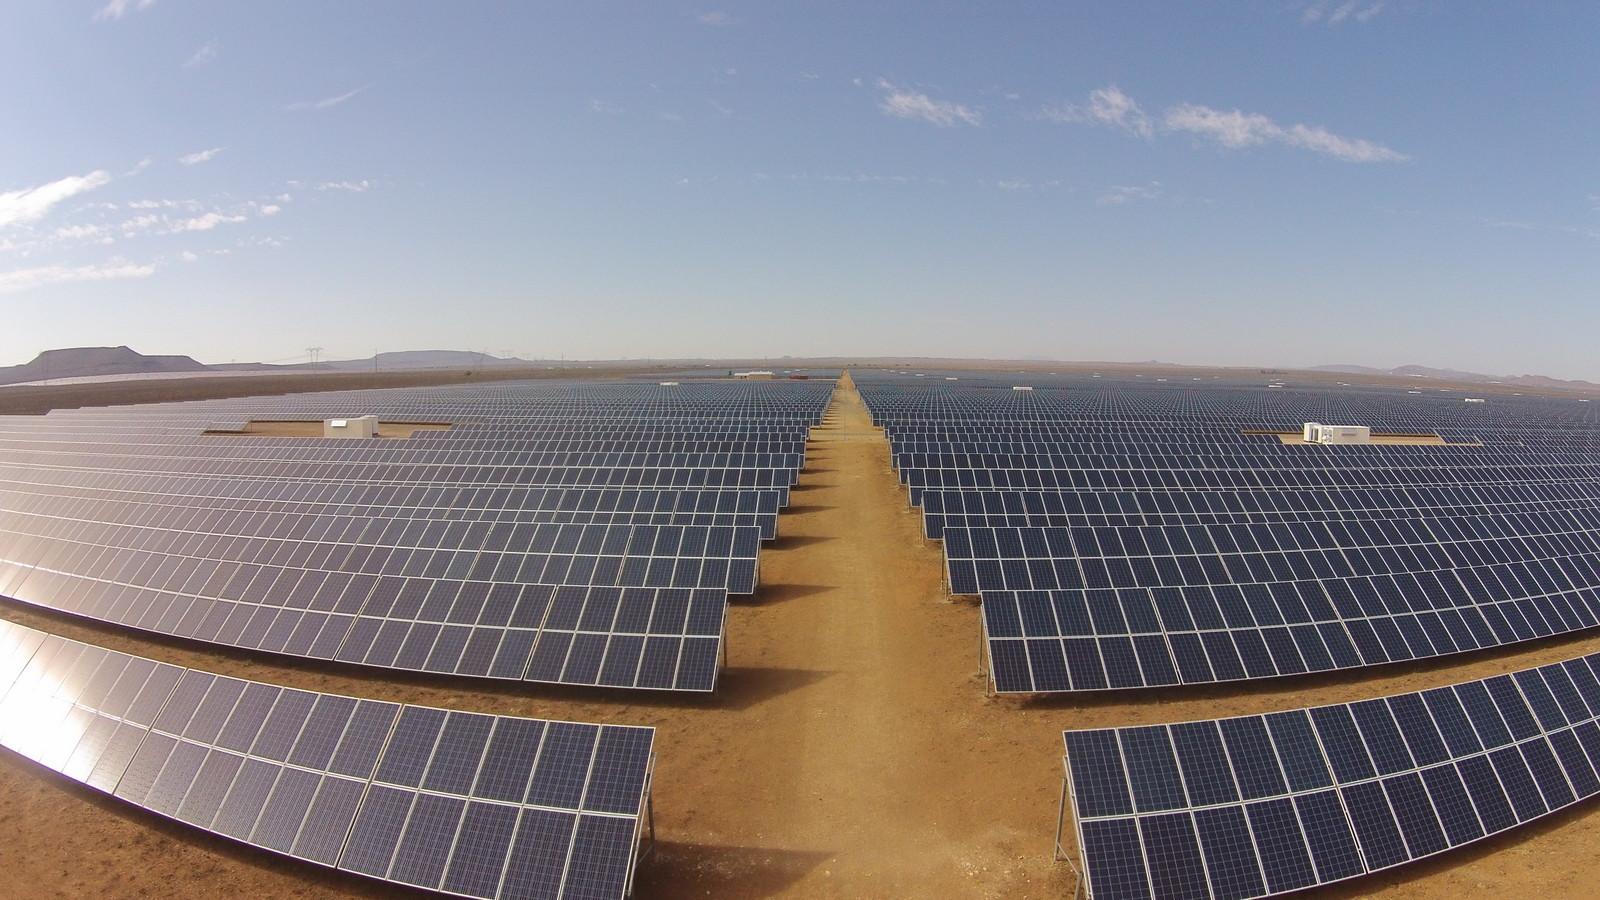 Phelan Energy Developing 15 Mw Solar Plant In Afghanistan